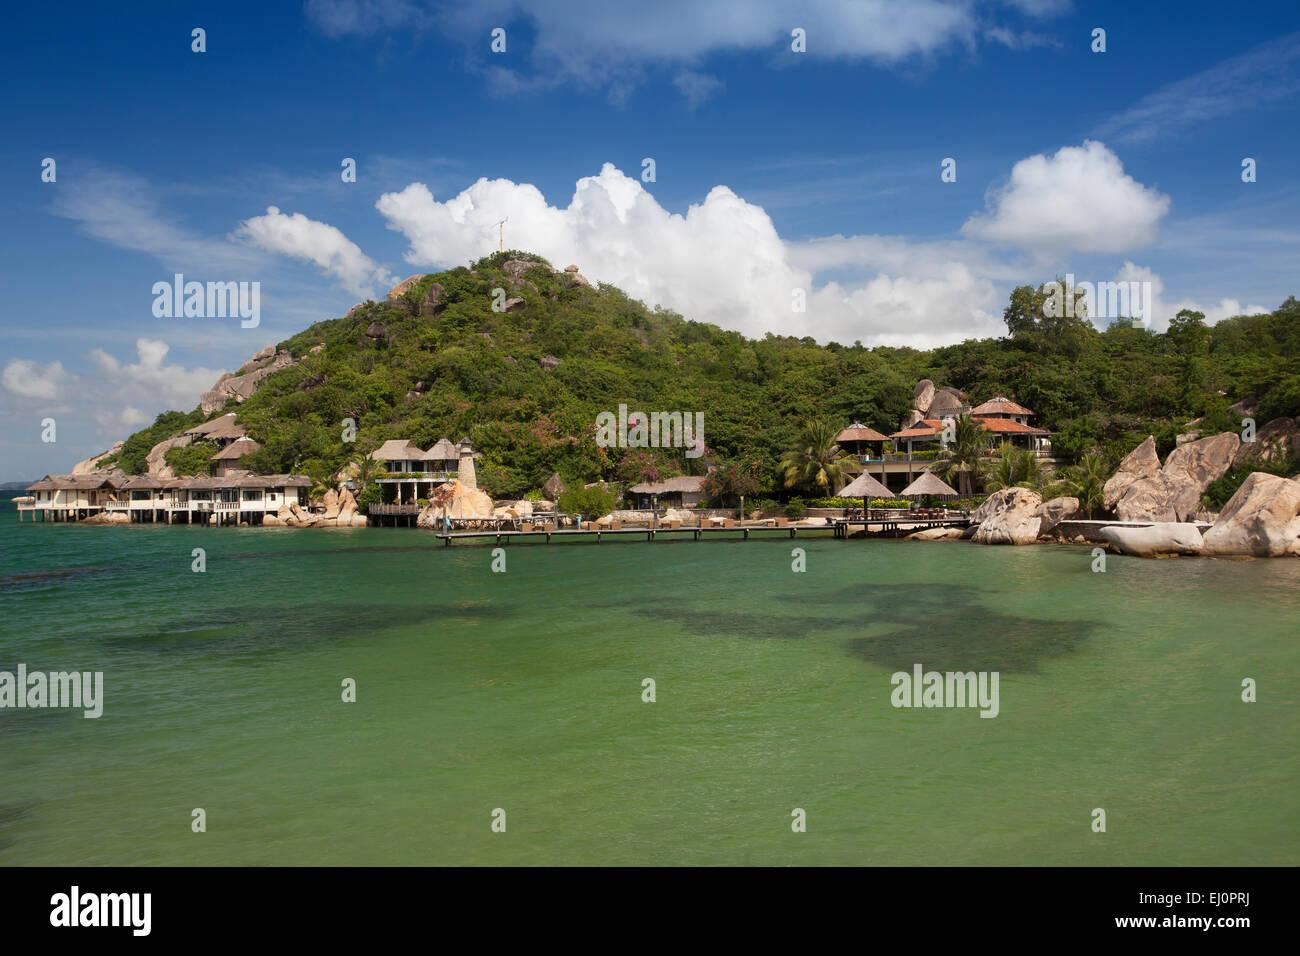 Bath bay, beach, hotel, little, bungalow, Resort, Ngoc, Suong, Cam, Ranh, bay, South China Sea, sea, Asian, Asia, - Stock Image